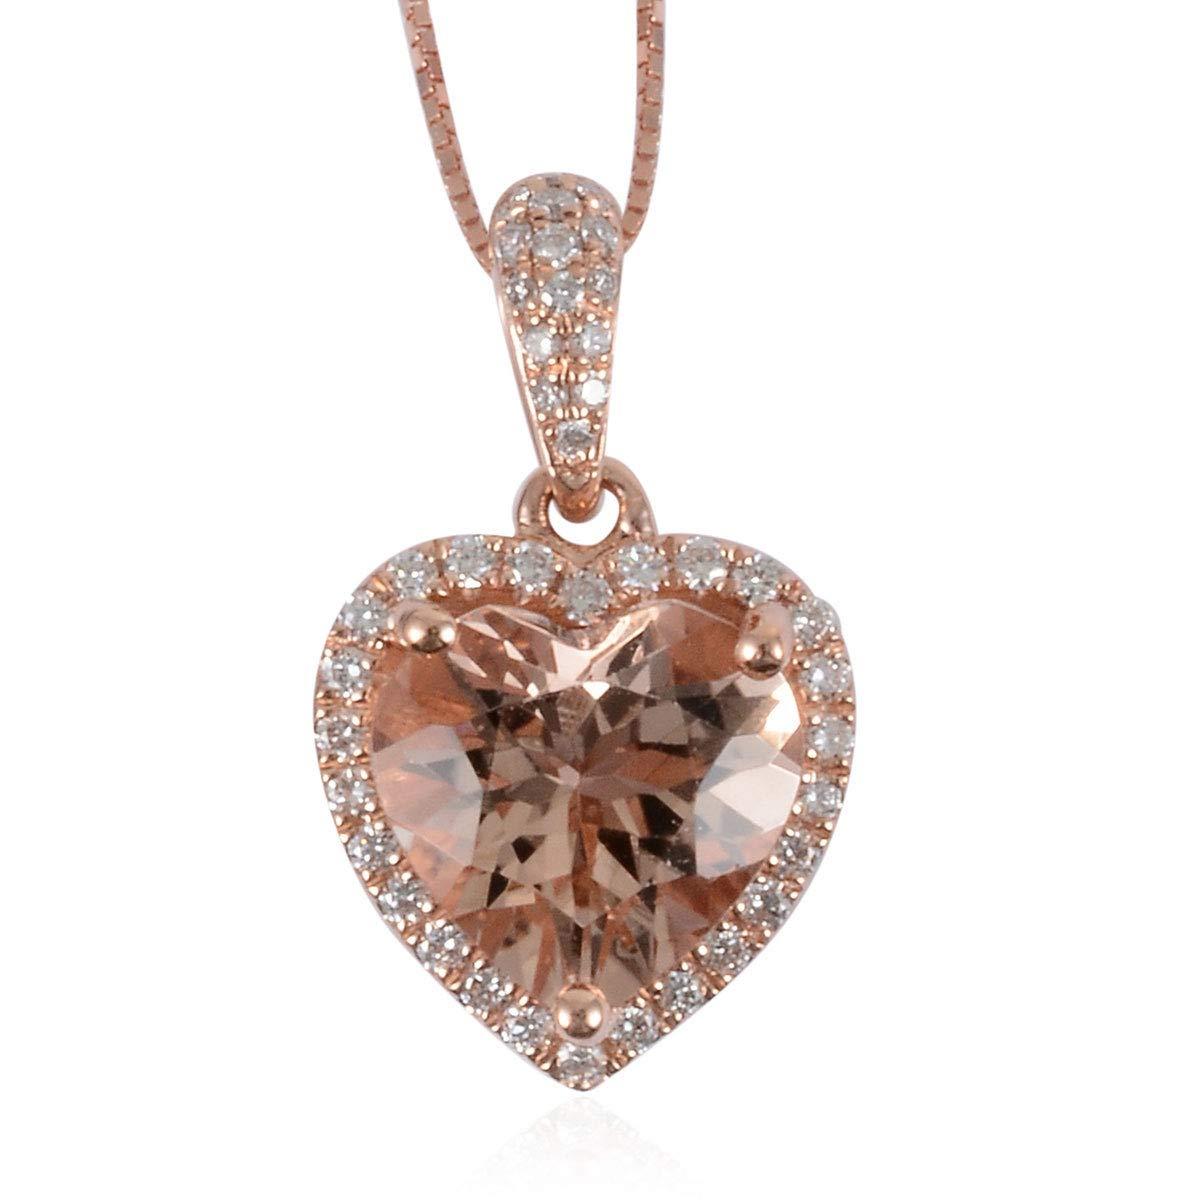 "18K Rose Gold ILIANA AAA Premium Morganite Diamond Valentine Heart Pendant Necklace Gift Jewelry Women 18"" Ct 2 G-H Color SI1"